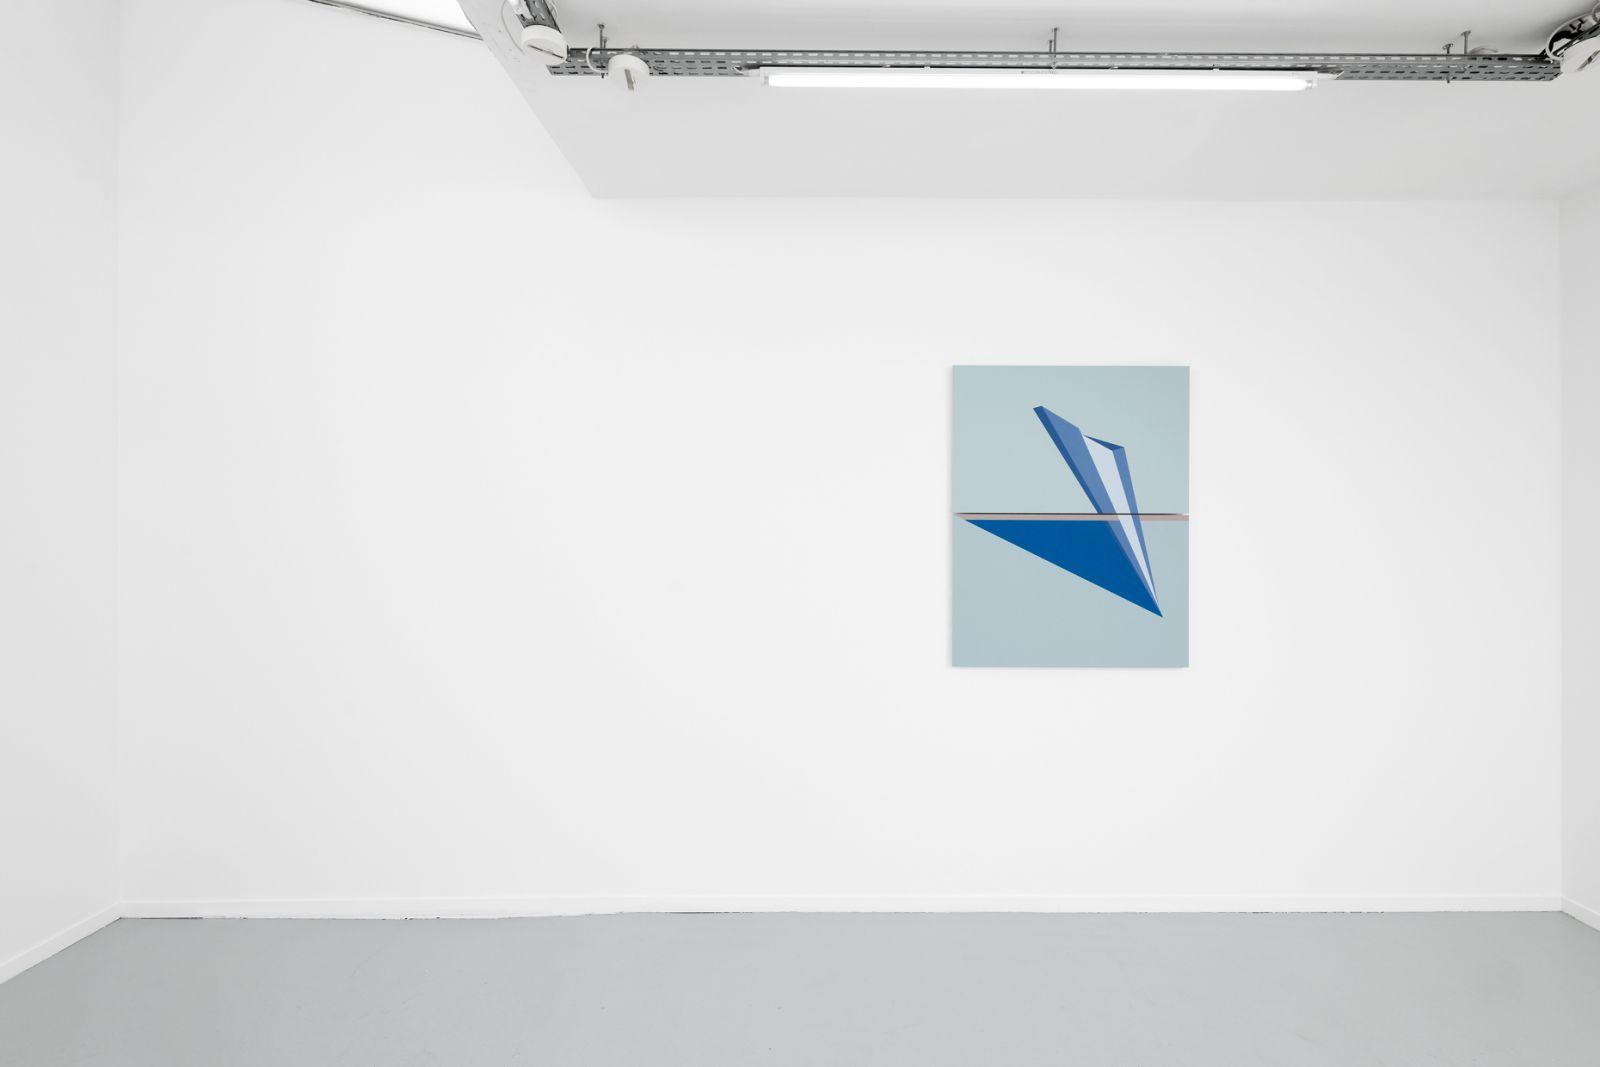 04-parties-fines-progress-gallery-vue-expo-2-aurelien-mole-web-6ee5ed6426af283cf7f8f8709d0b9365